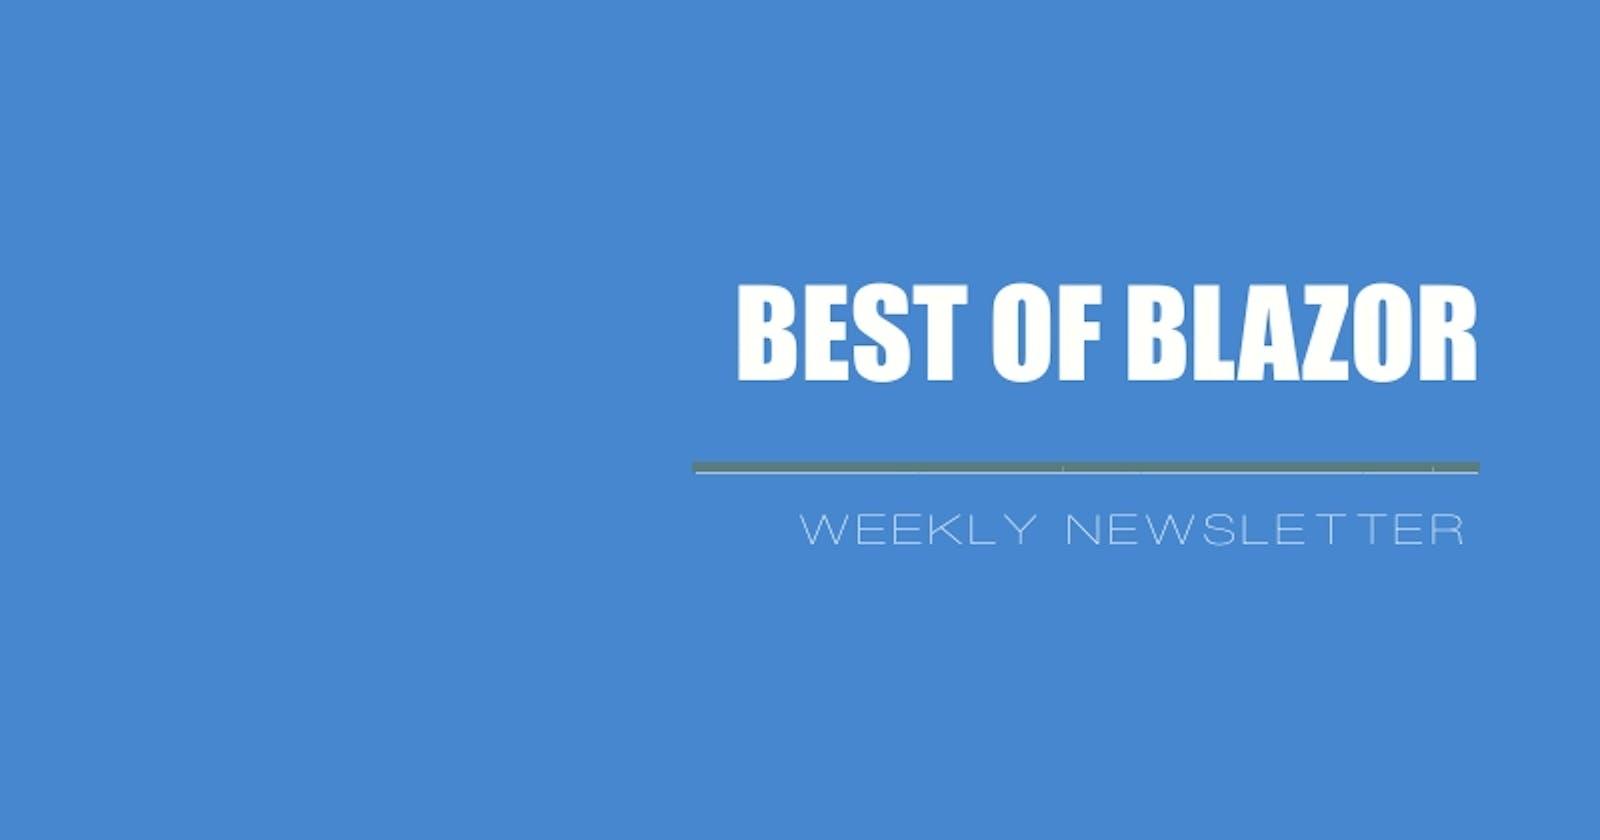 Blazor Weekly Newsletter #26